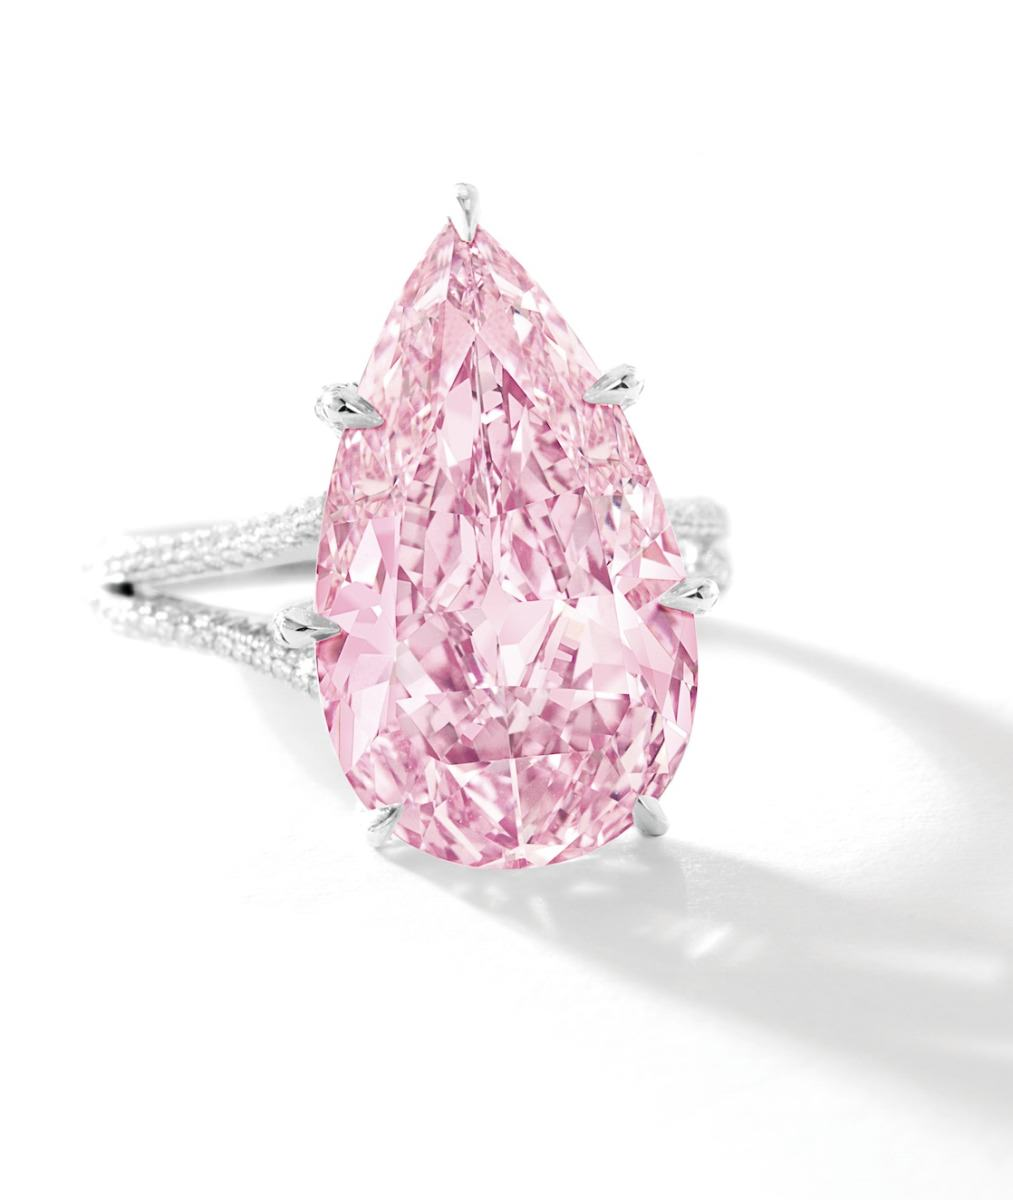 8.41-carat-Internally-Flawless-Fancy-Vivid-Purple-Pink-Diamond-1013x1200